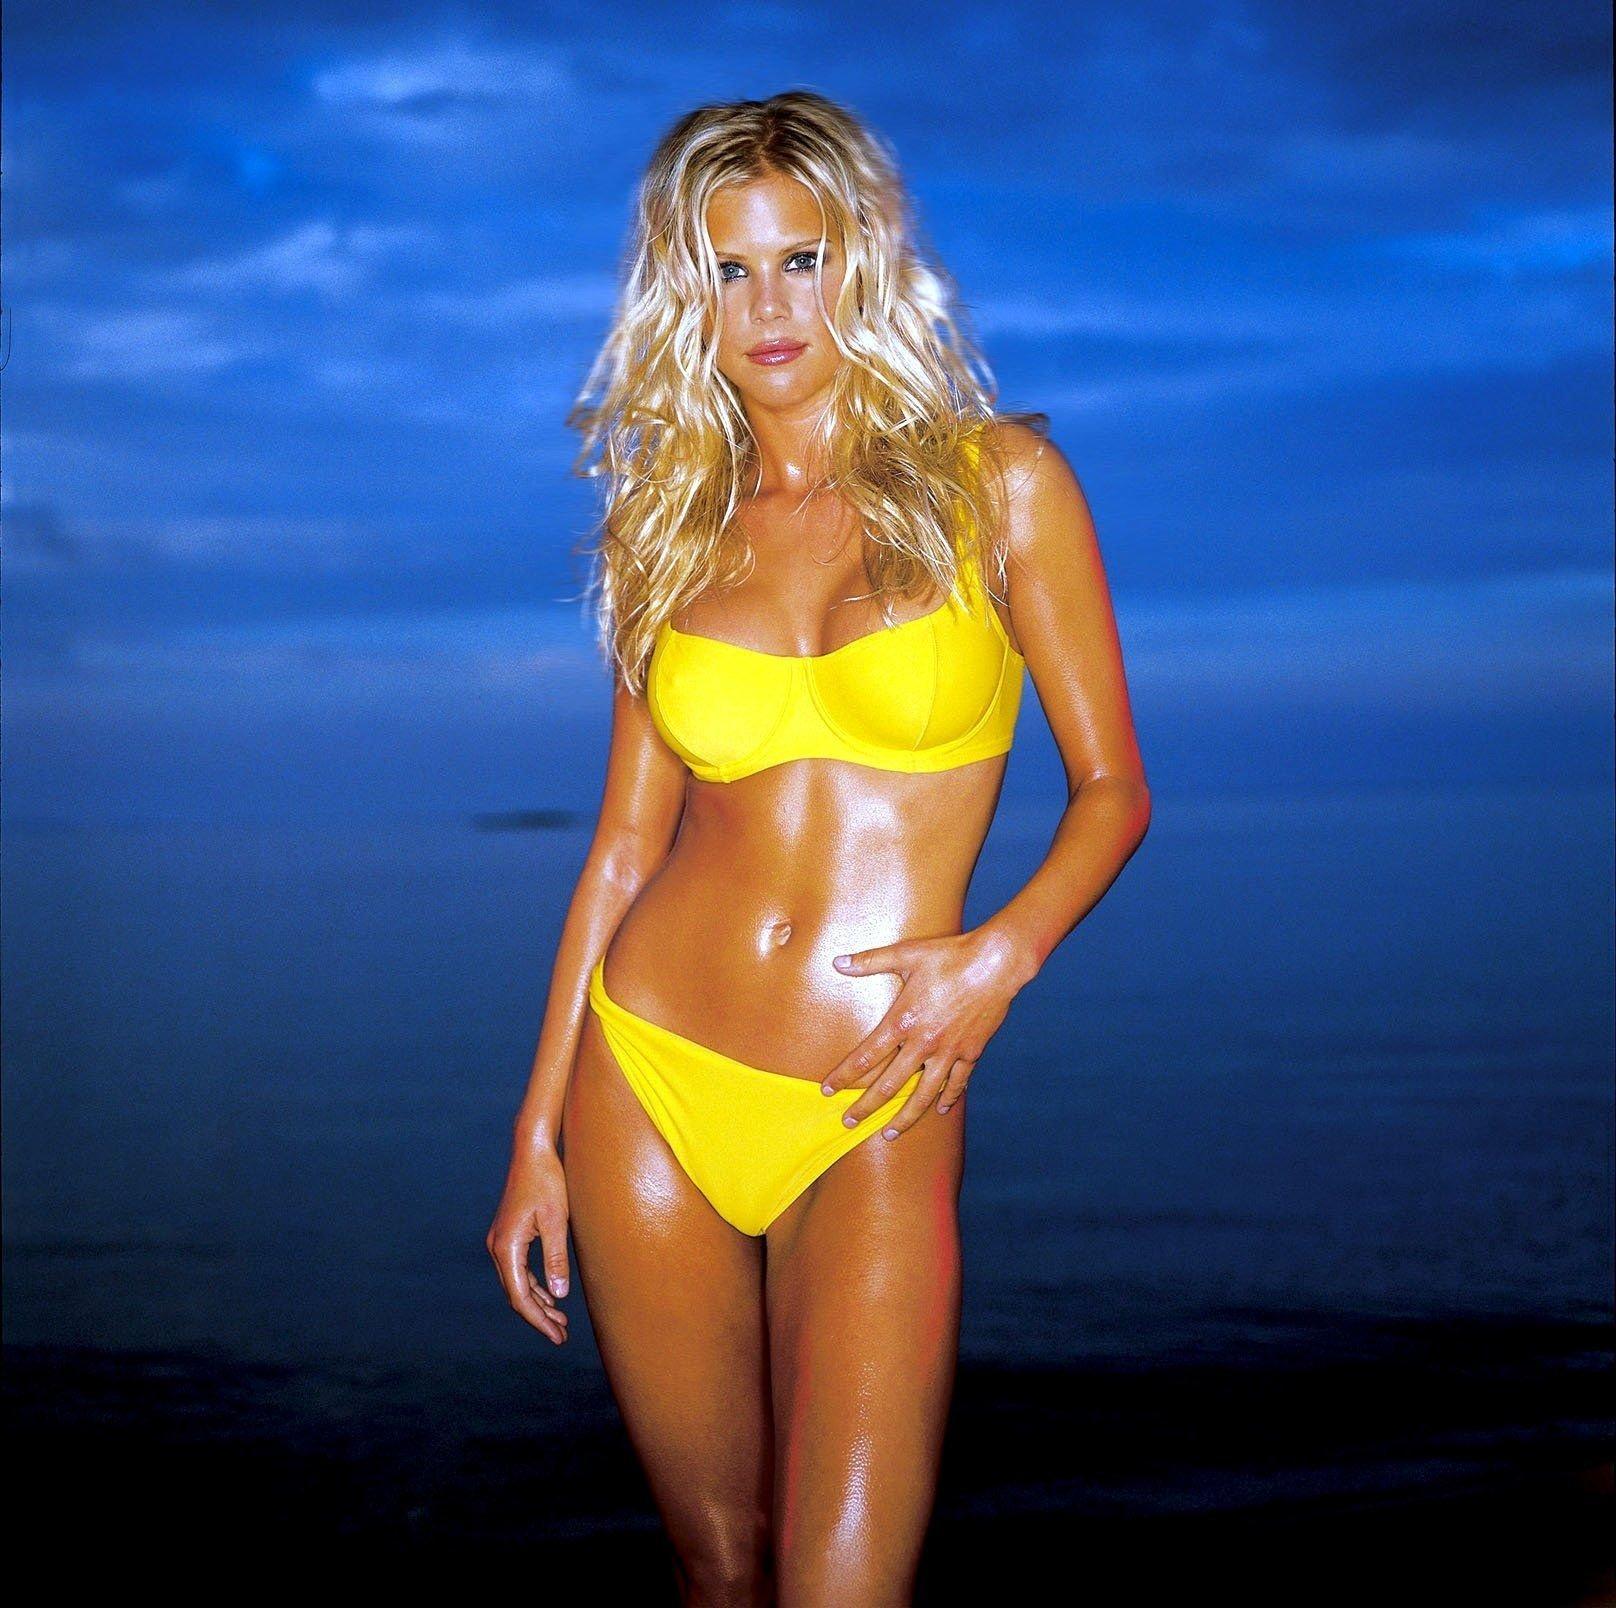 Swede Elin Nordegren is a former model